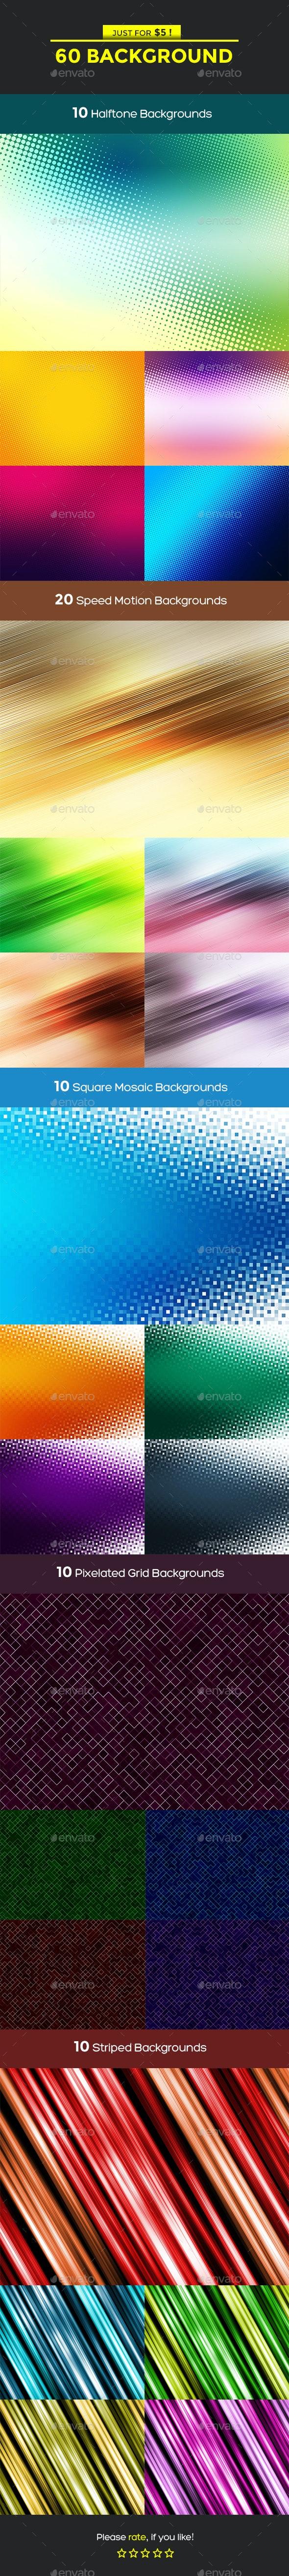 60 Background Bundle - Backgrounds Graphics